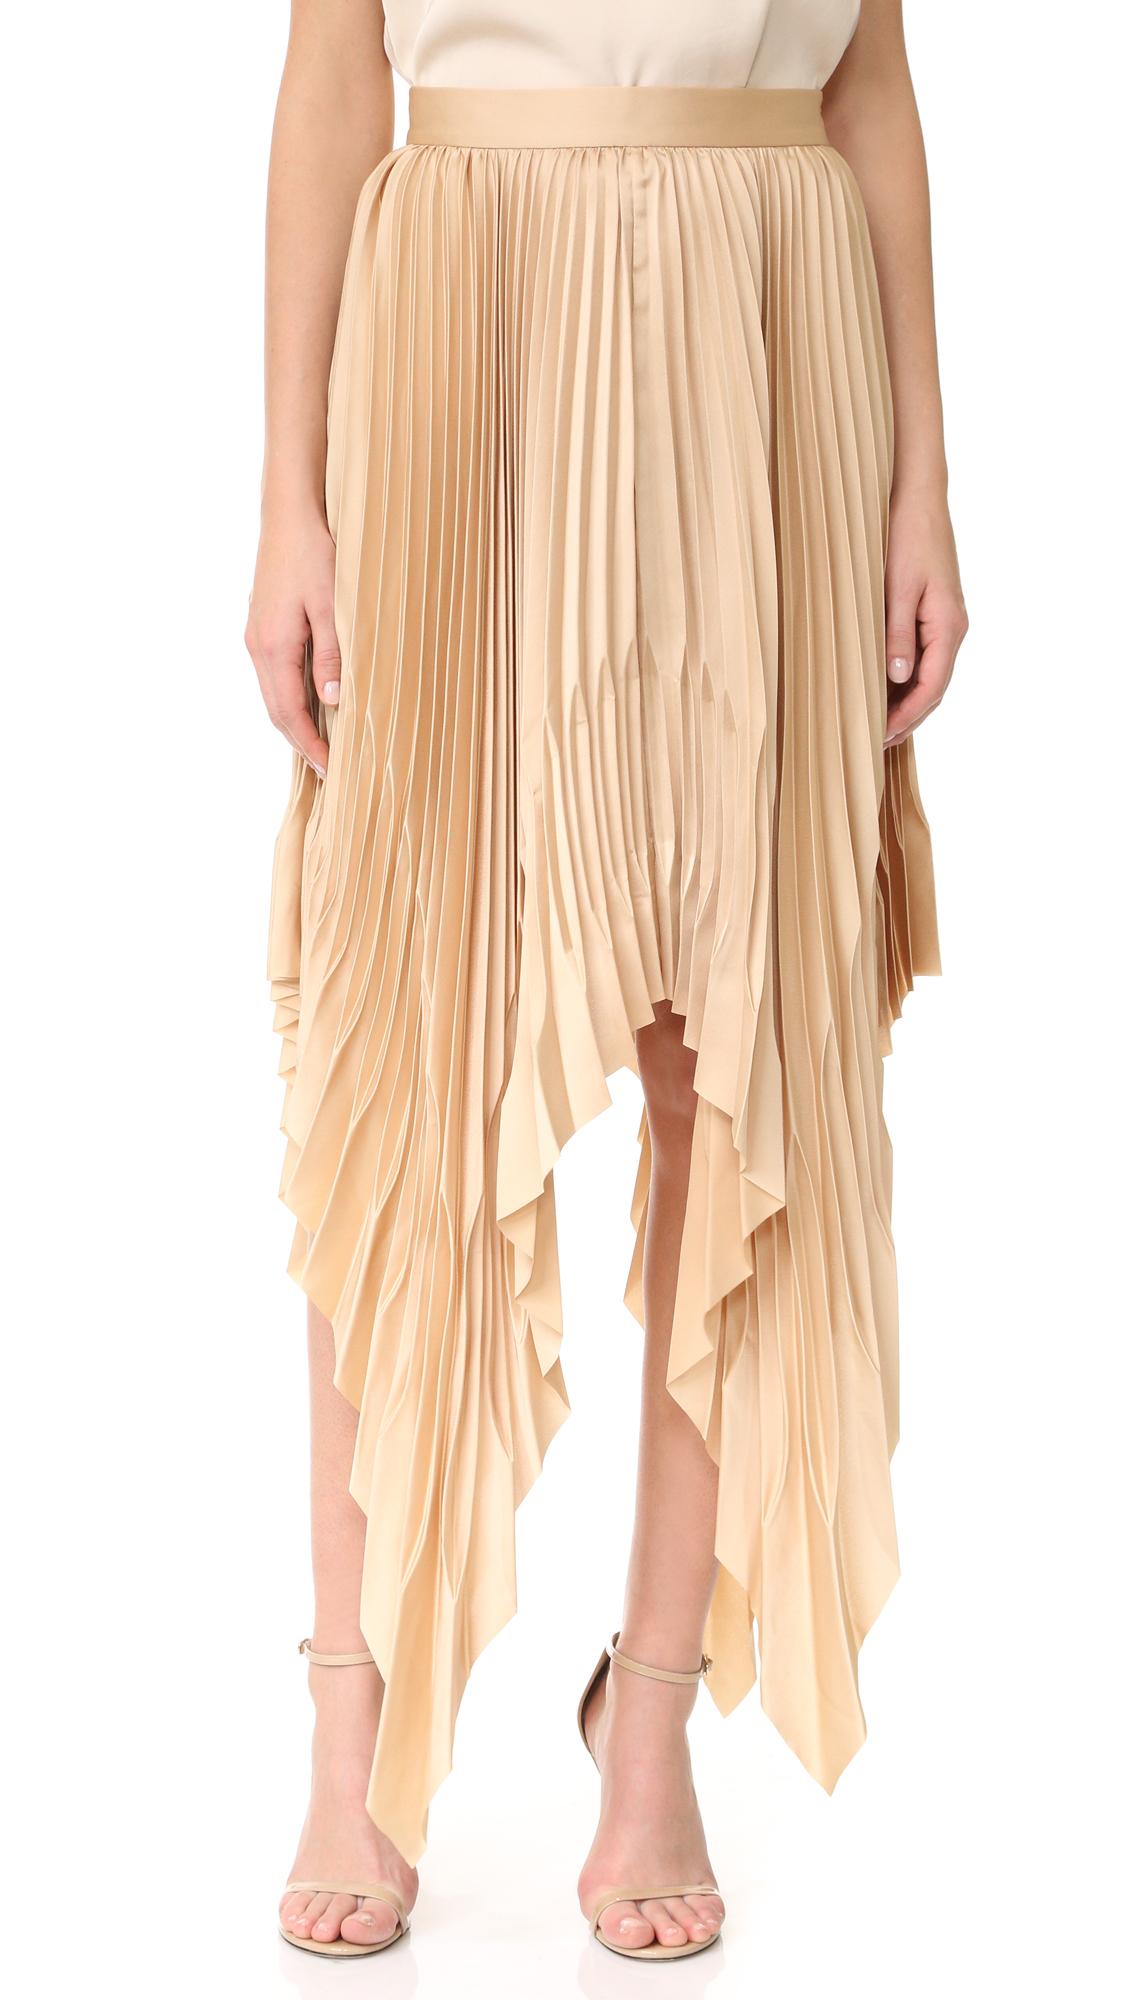 Acler Cedar Pleat Skirt - Almond at Shopbop